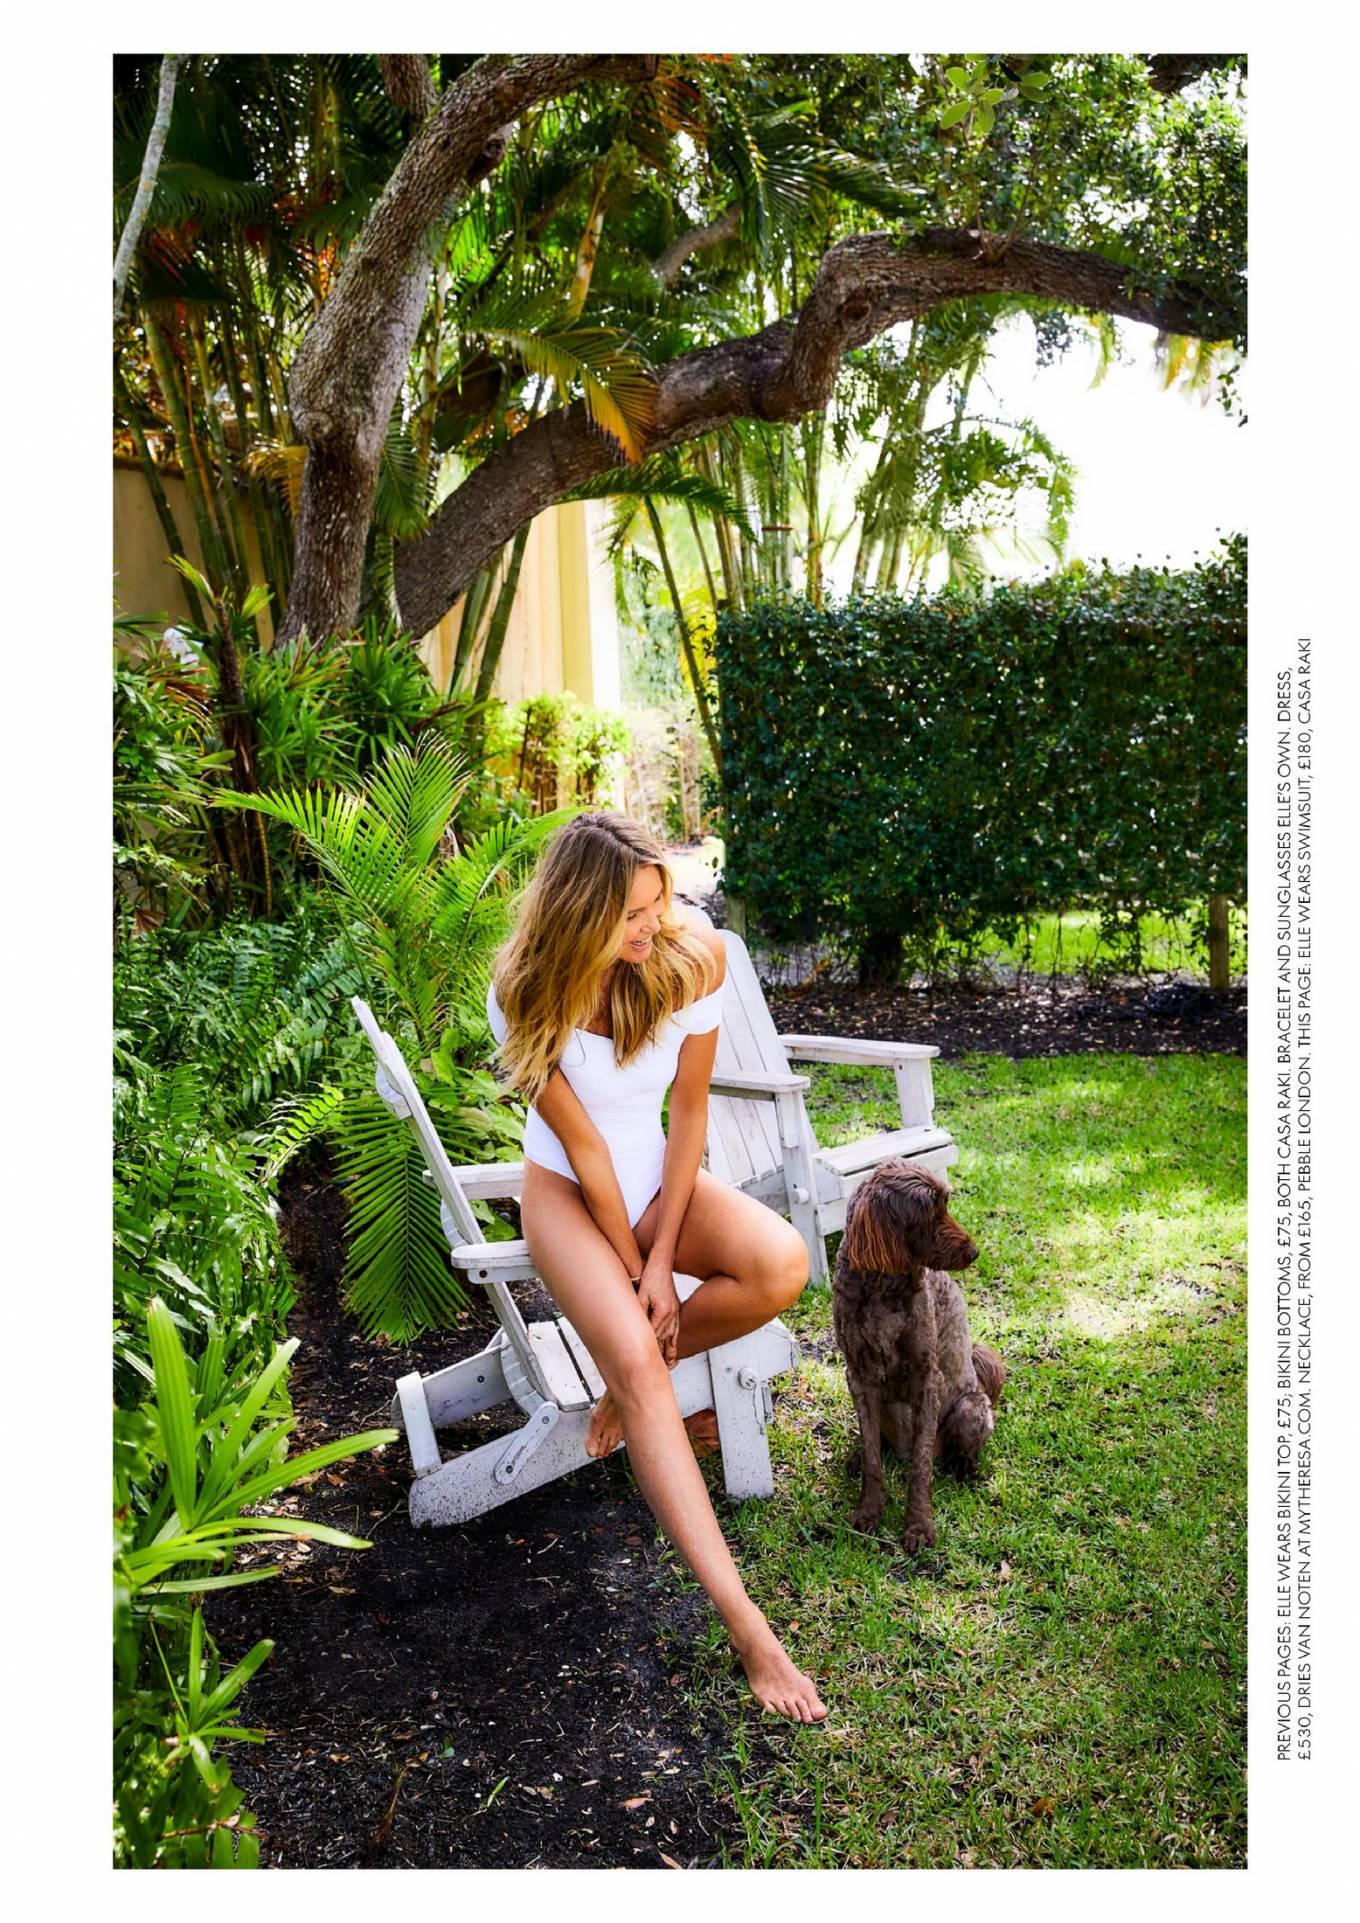 Elle MacPherson 2020 : Elle Macpherson – Red UK Magazine 2020-05